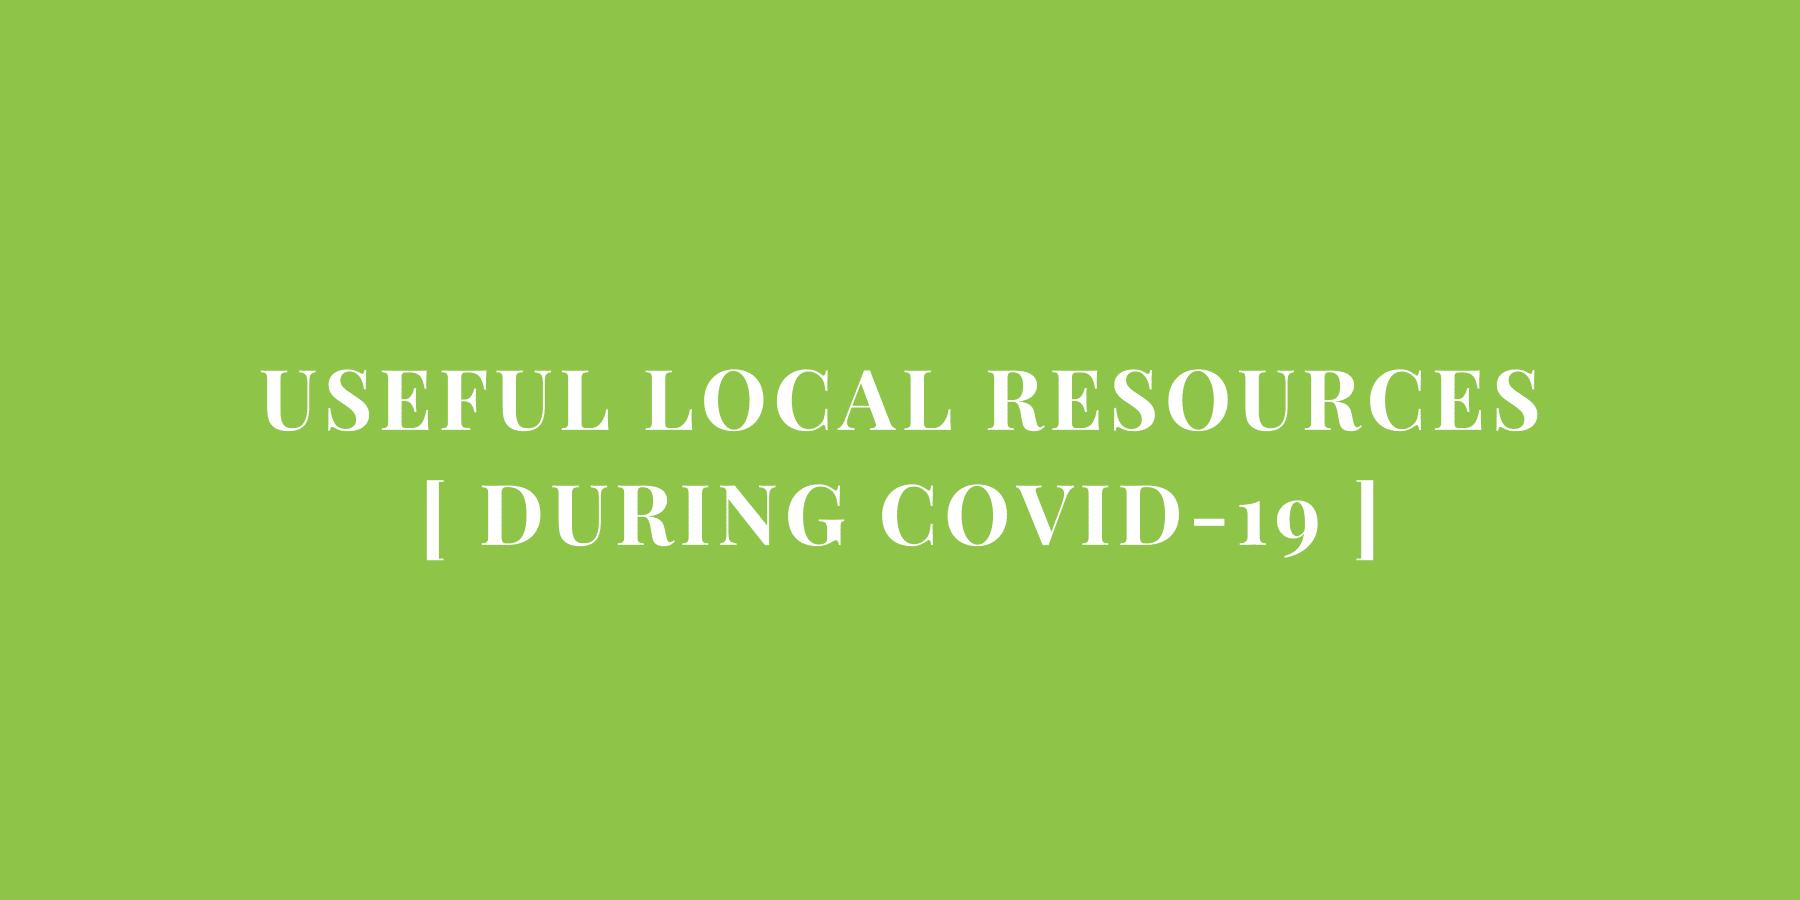 COVID-19 St. Tammany Parish